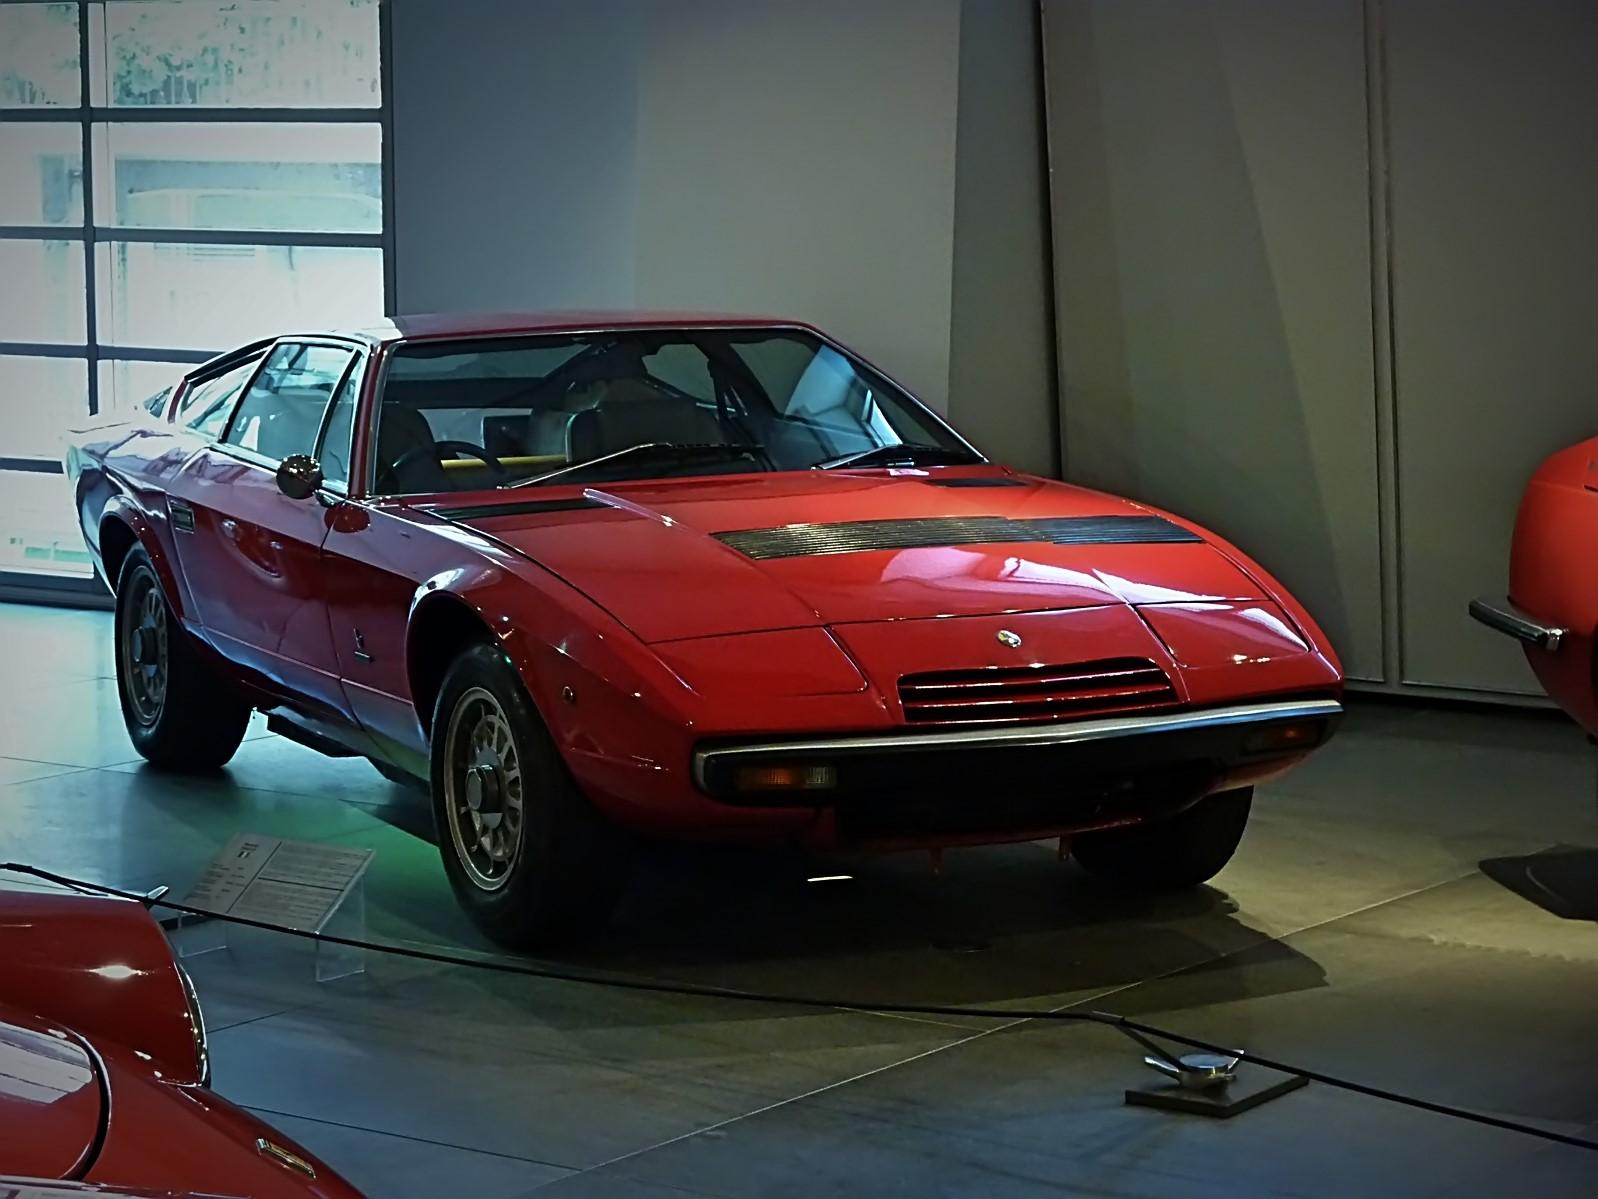 hellenic motor museum (23).JPG